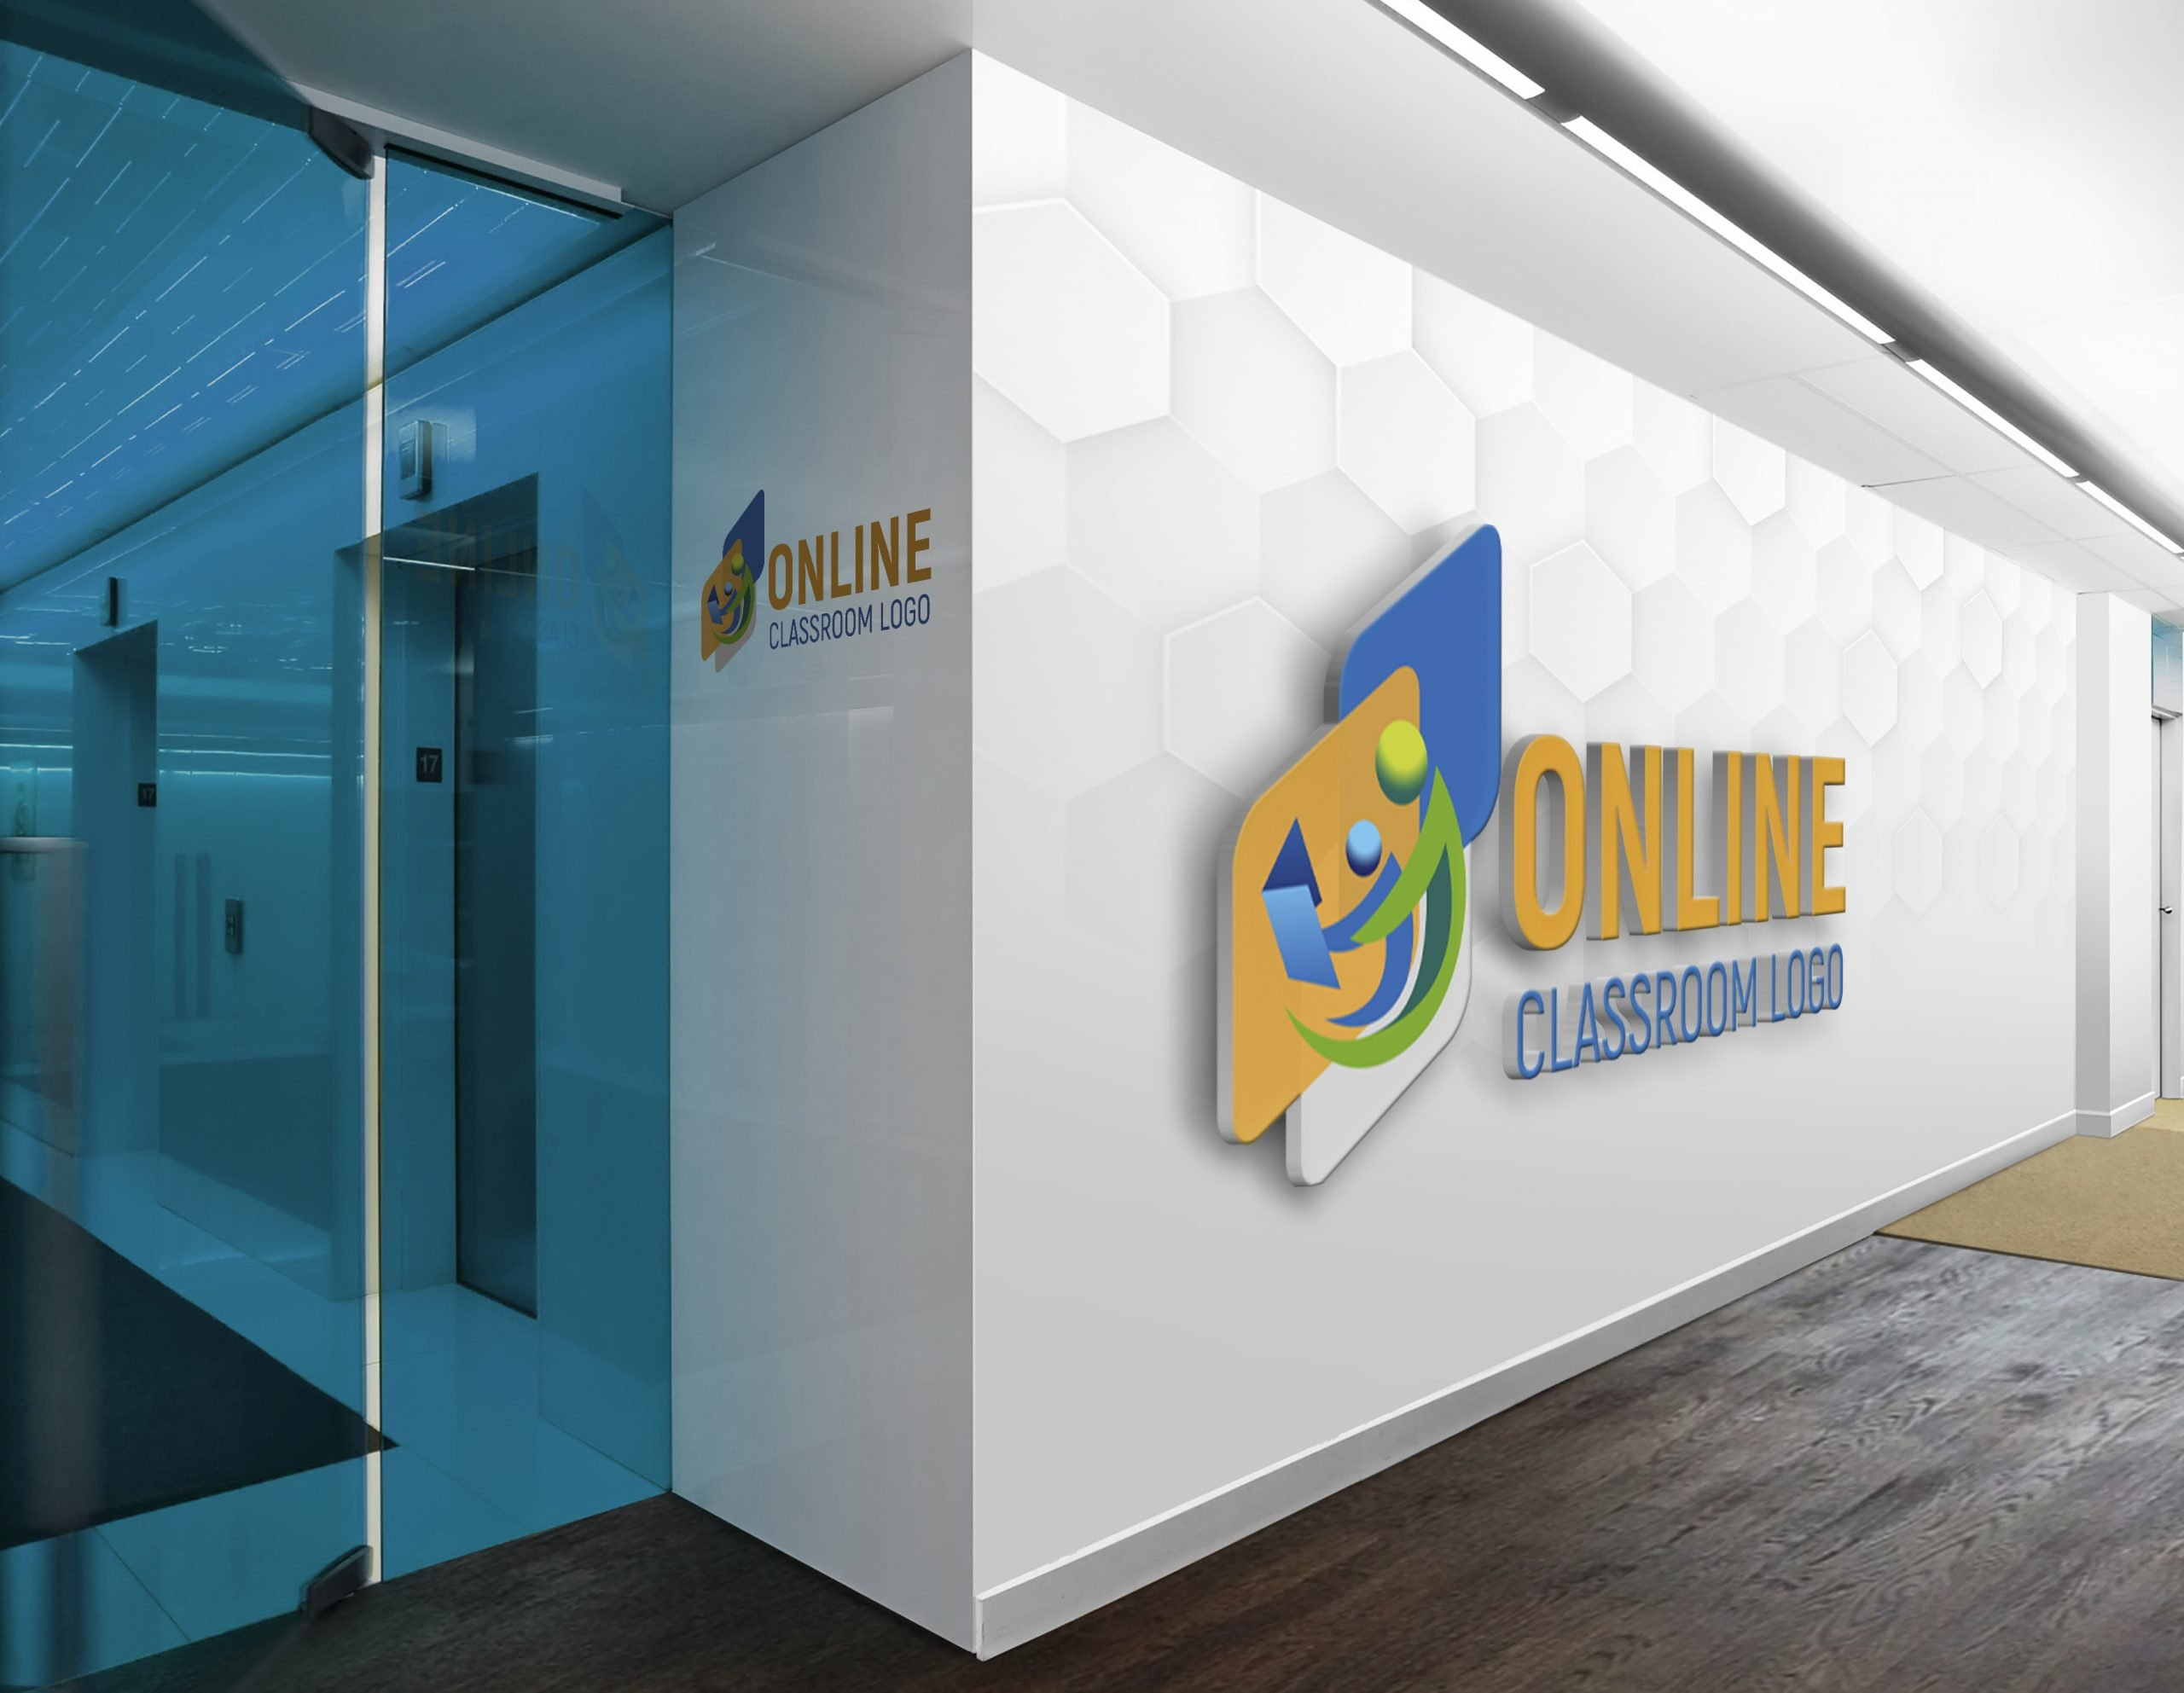 Online class logo on office wall